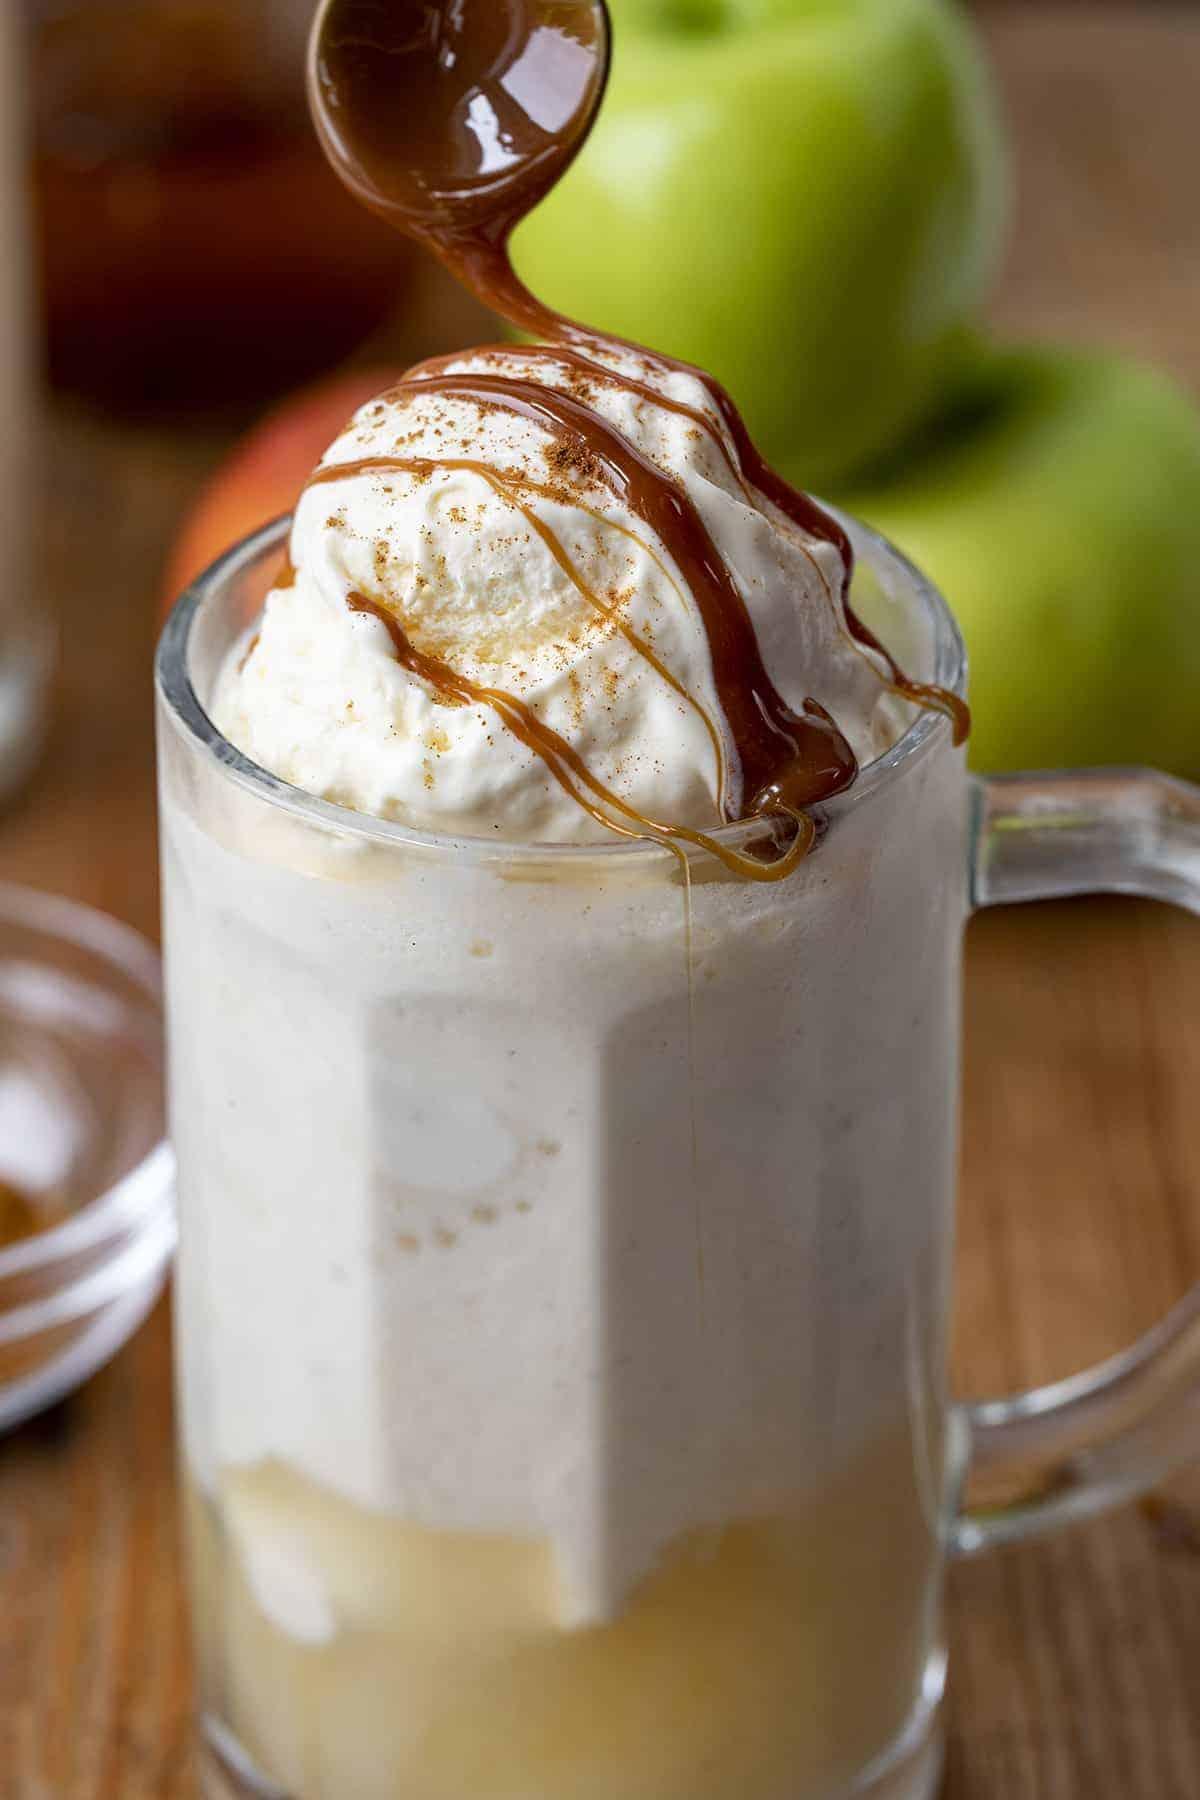 Drizzling Caramel on Apple Pie Moonshine Float